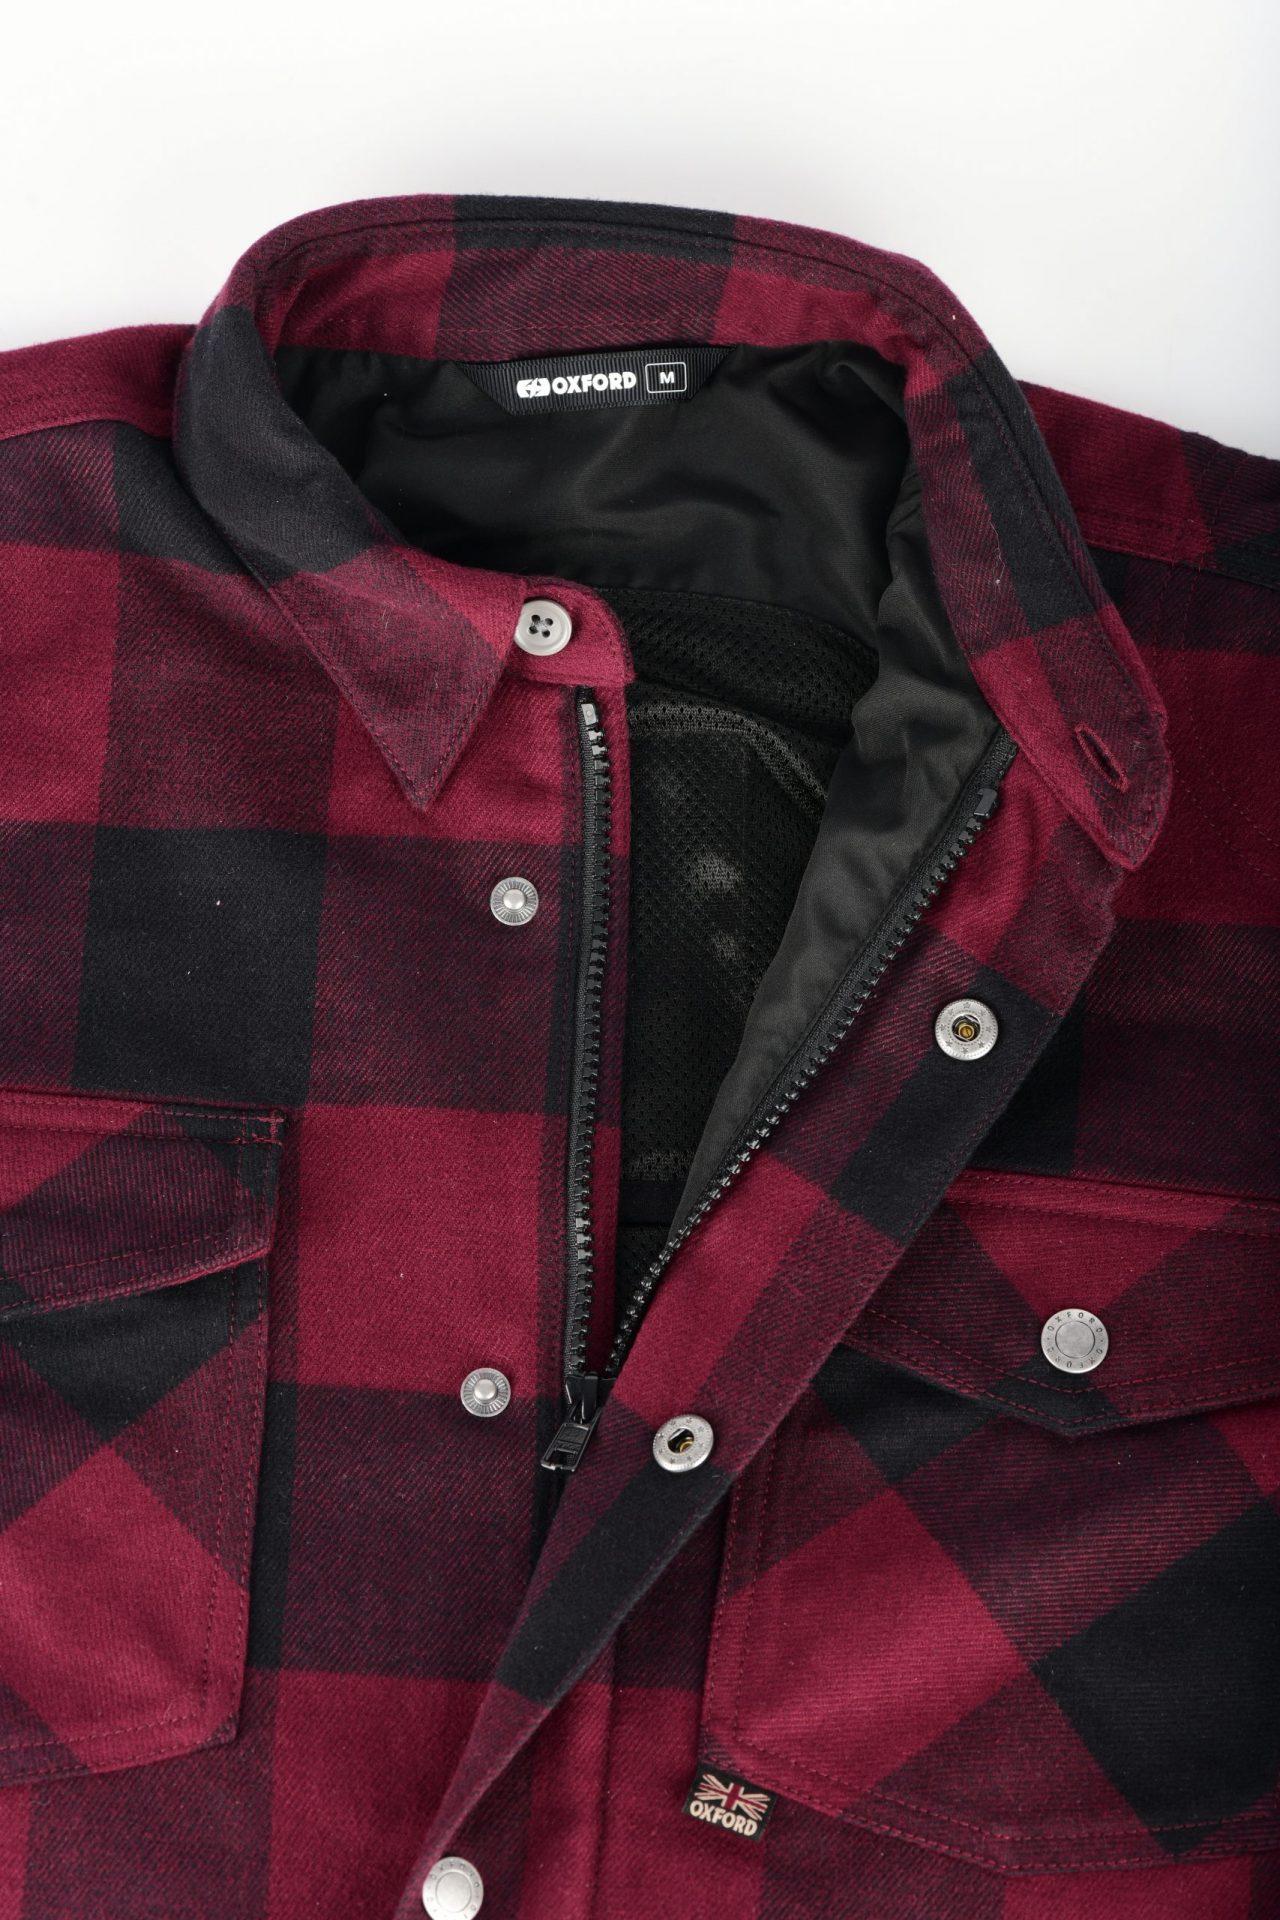 Kickback_Detail_4-scaled Kickback 2.0 Shirt